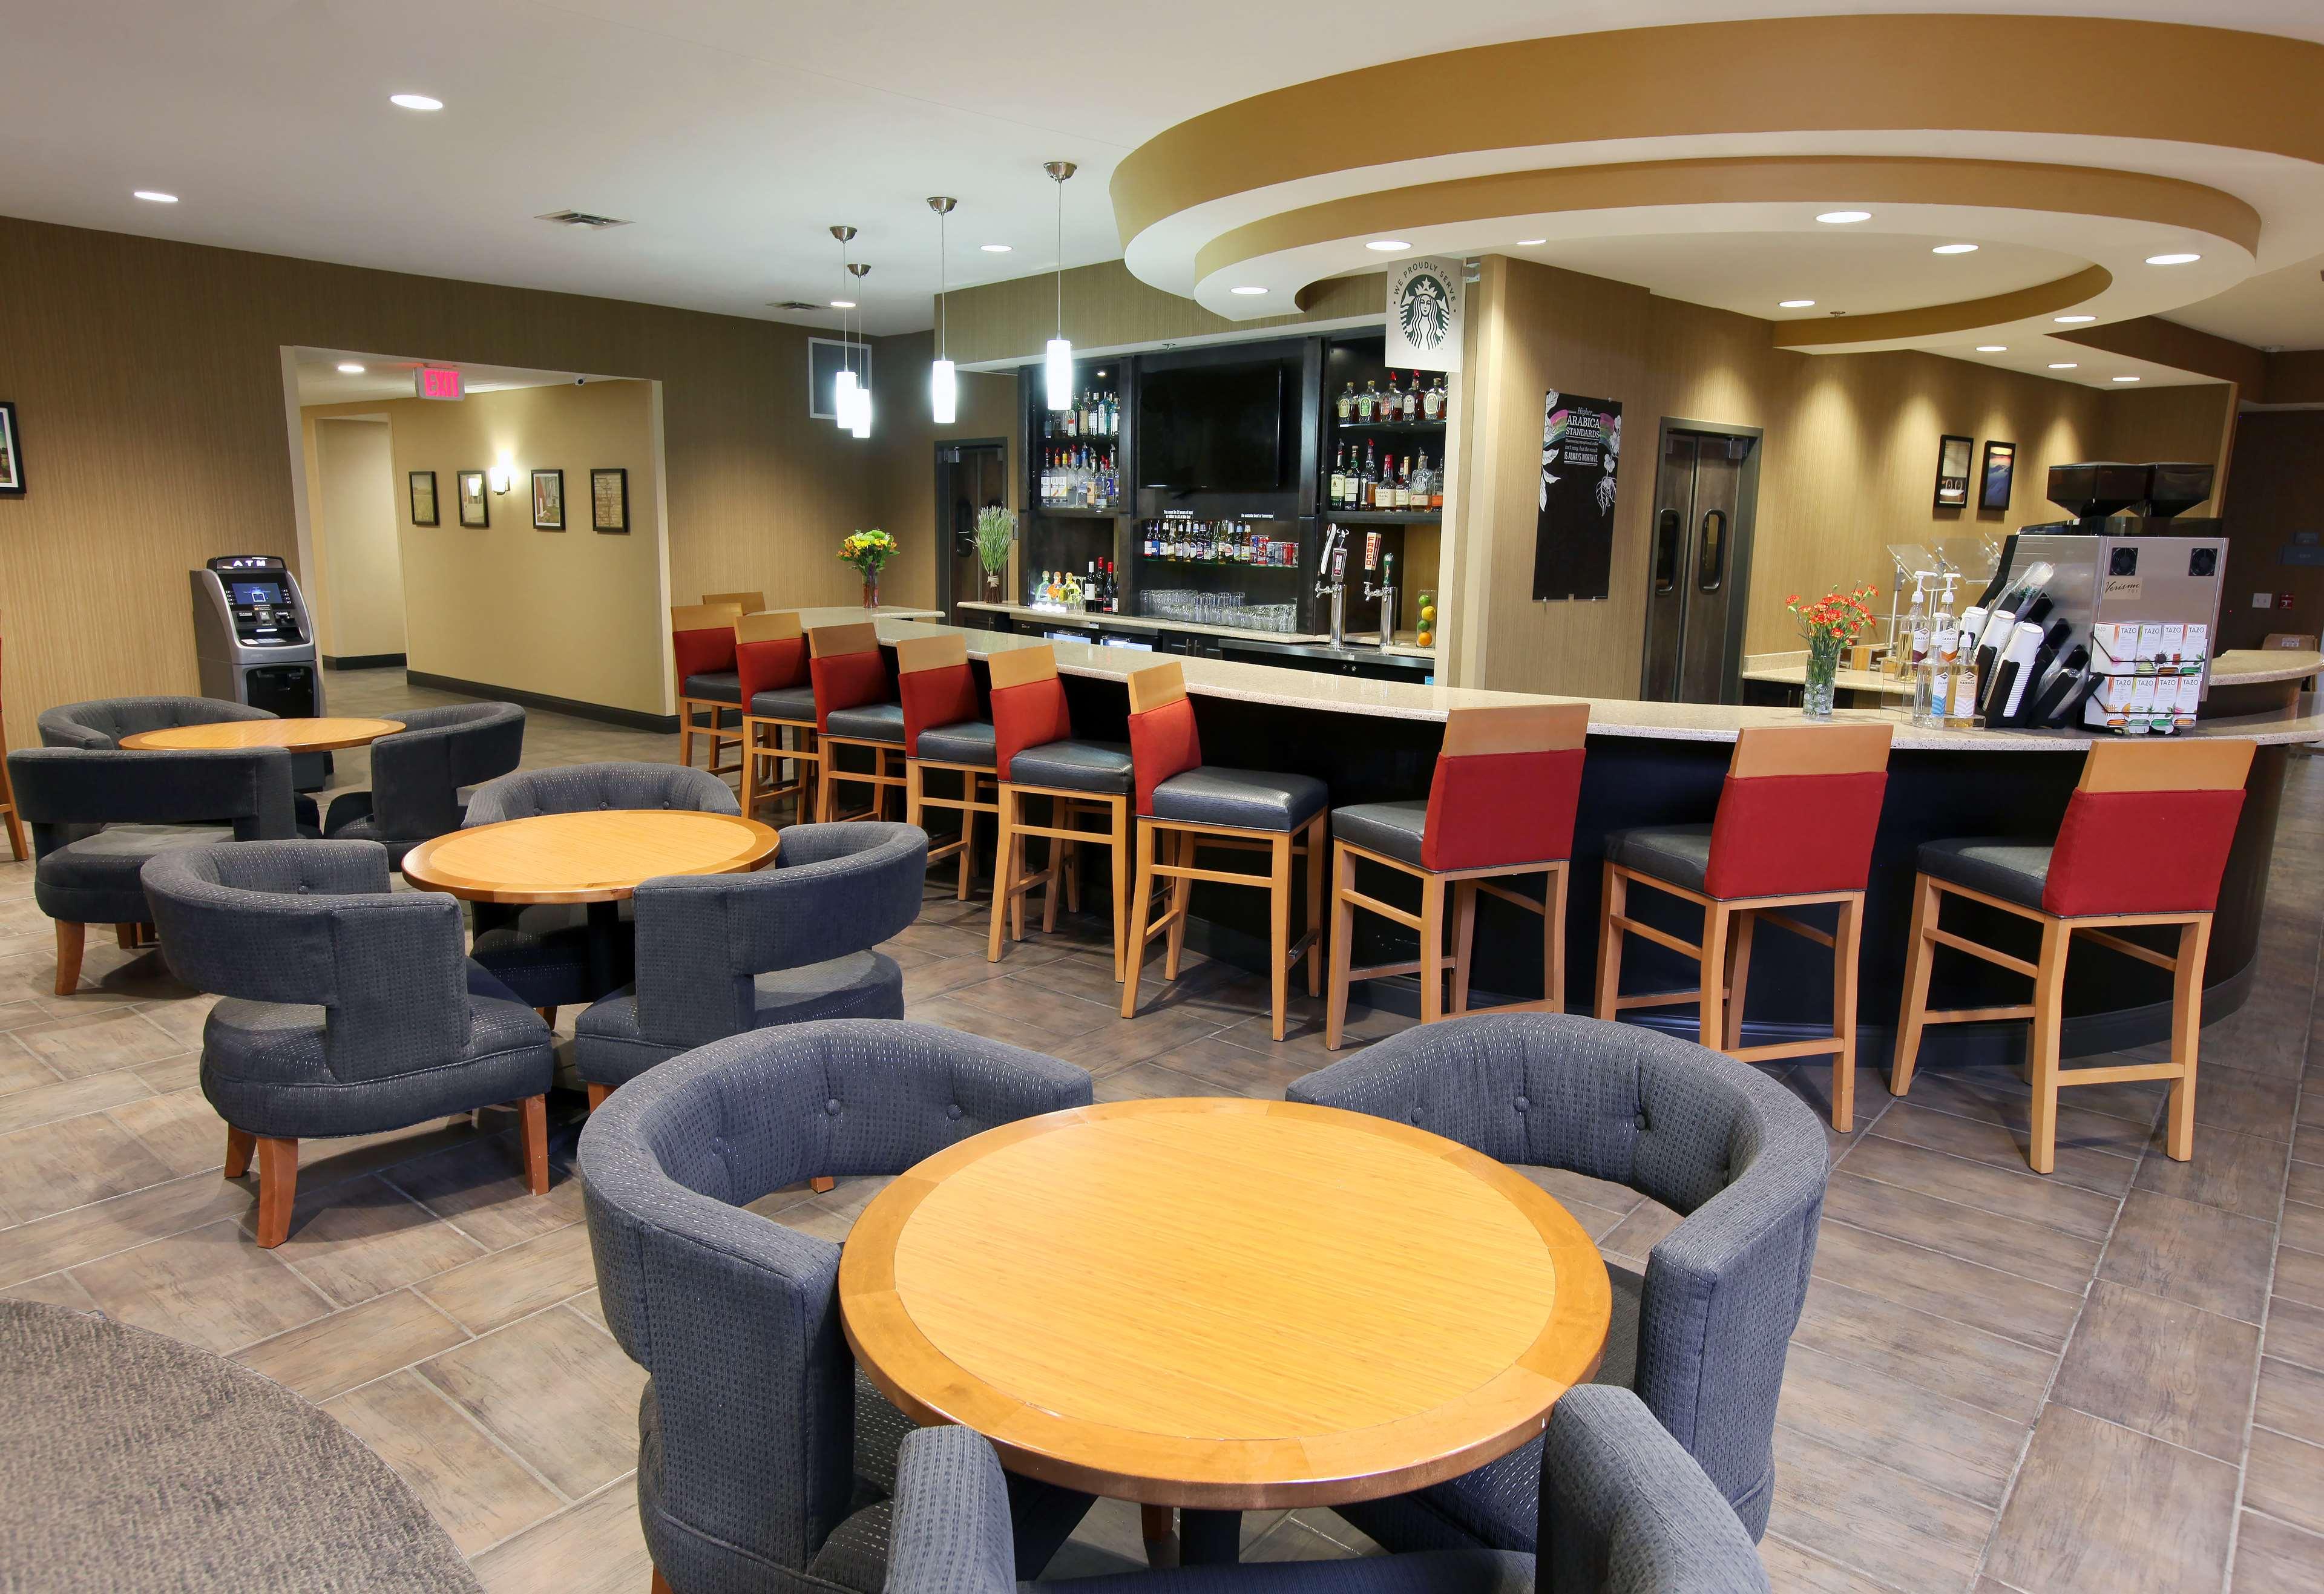 DoubleTree by Hilton West Fargo image 31